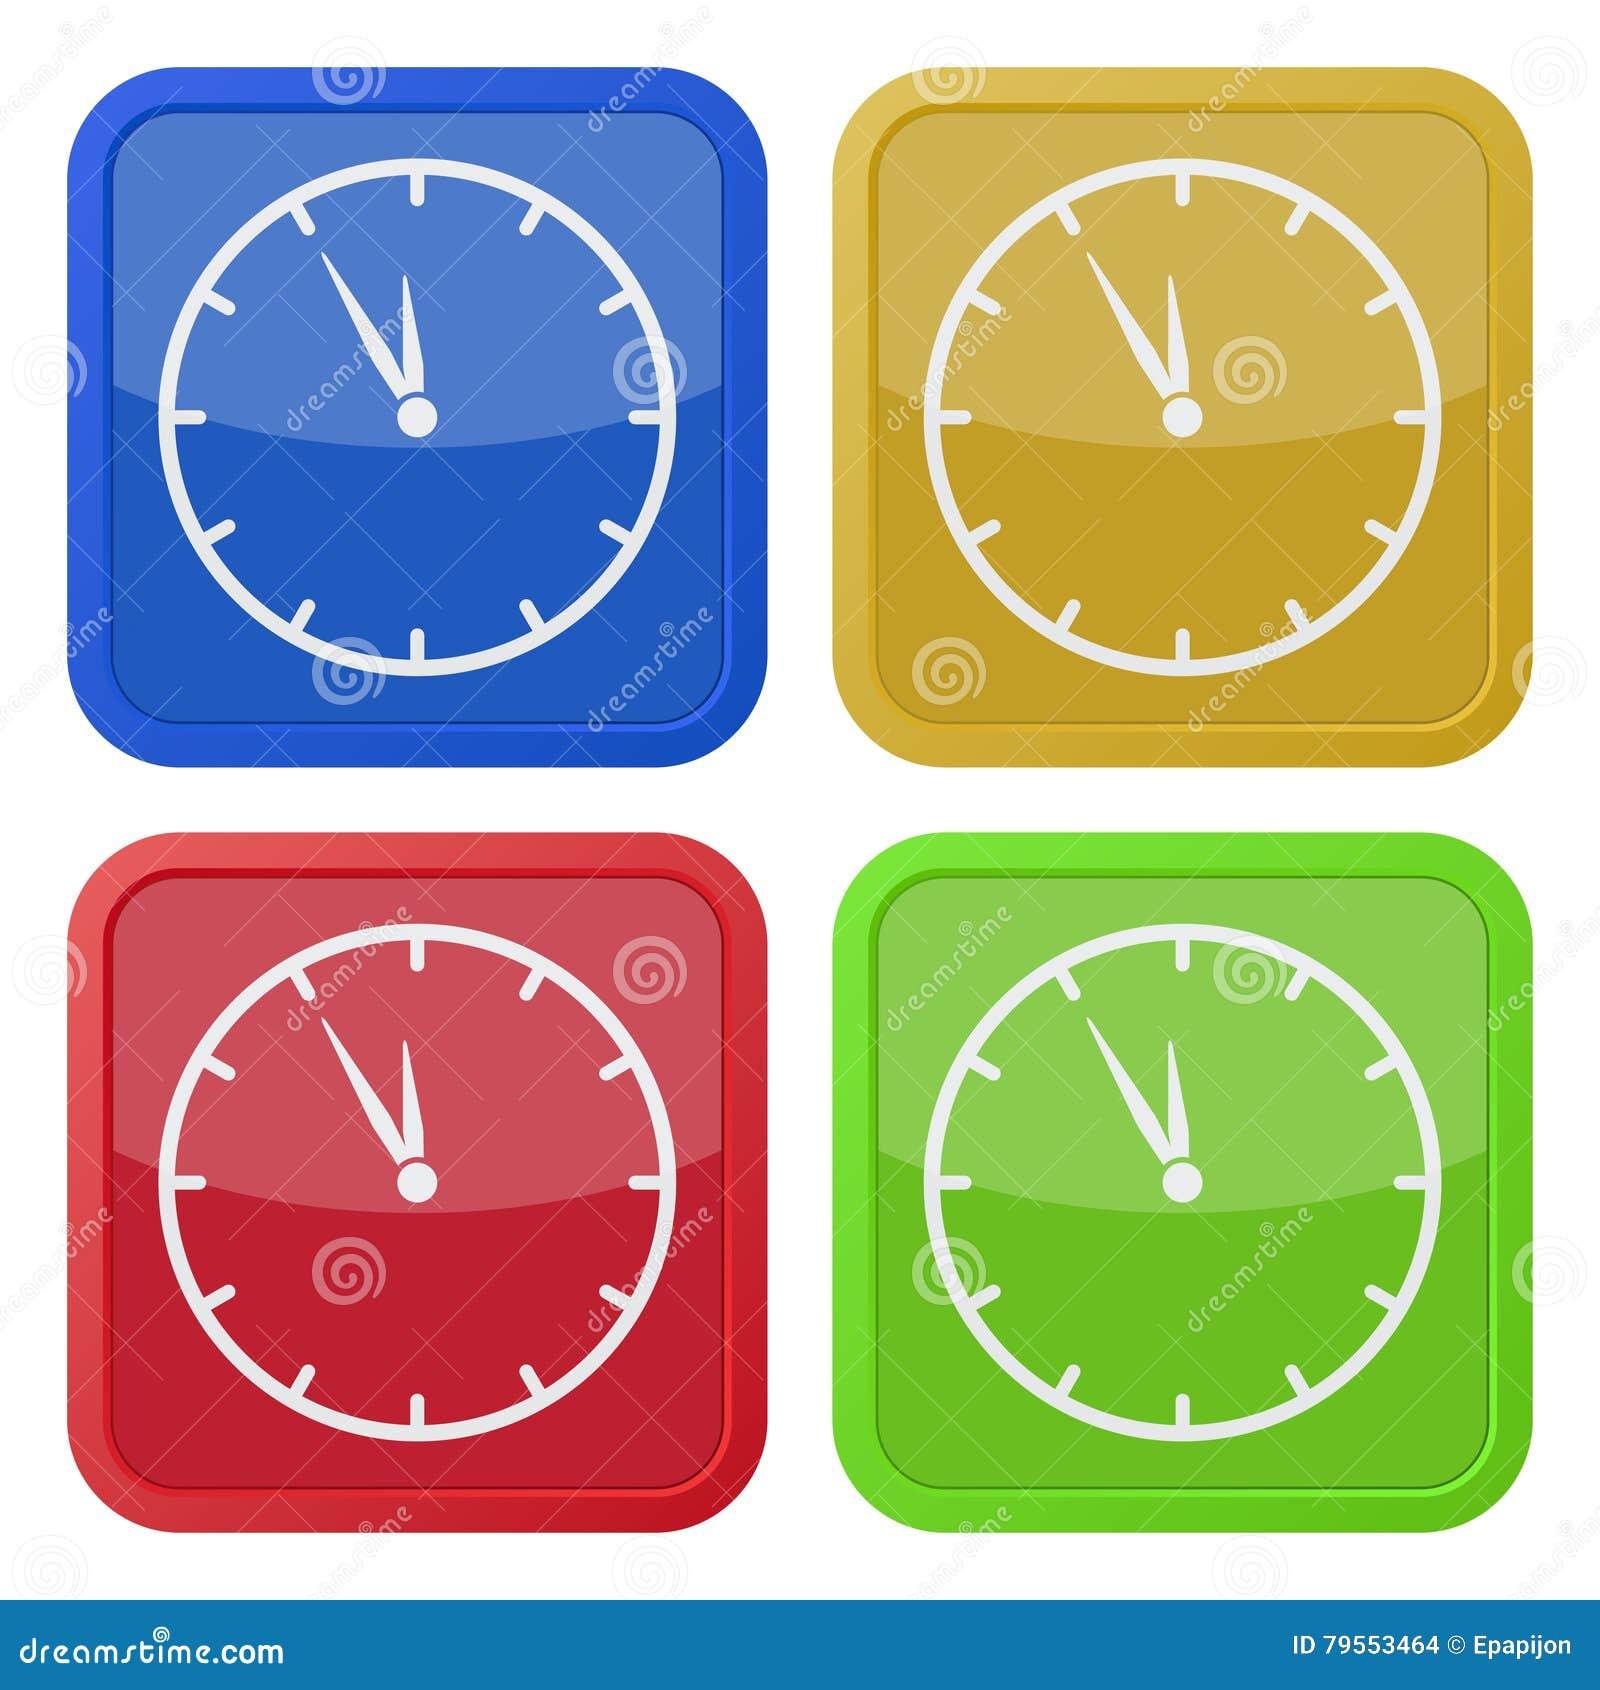 Four square color icons, last minute clock